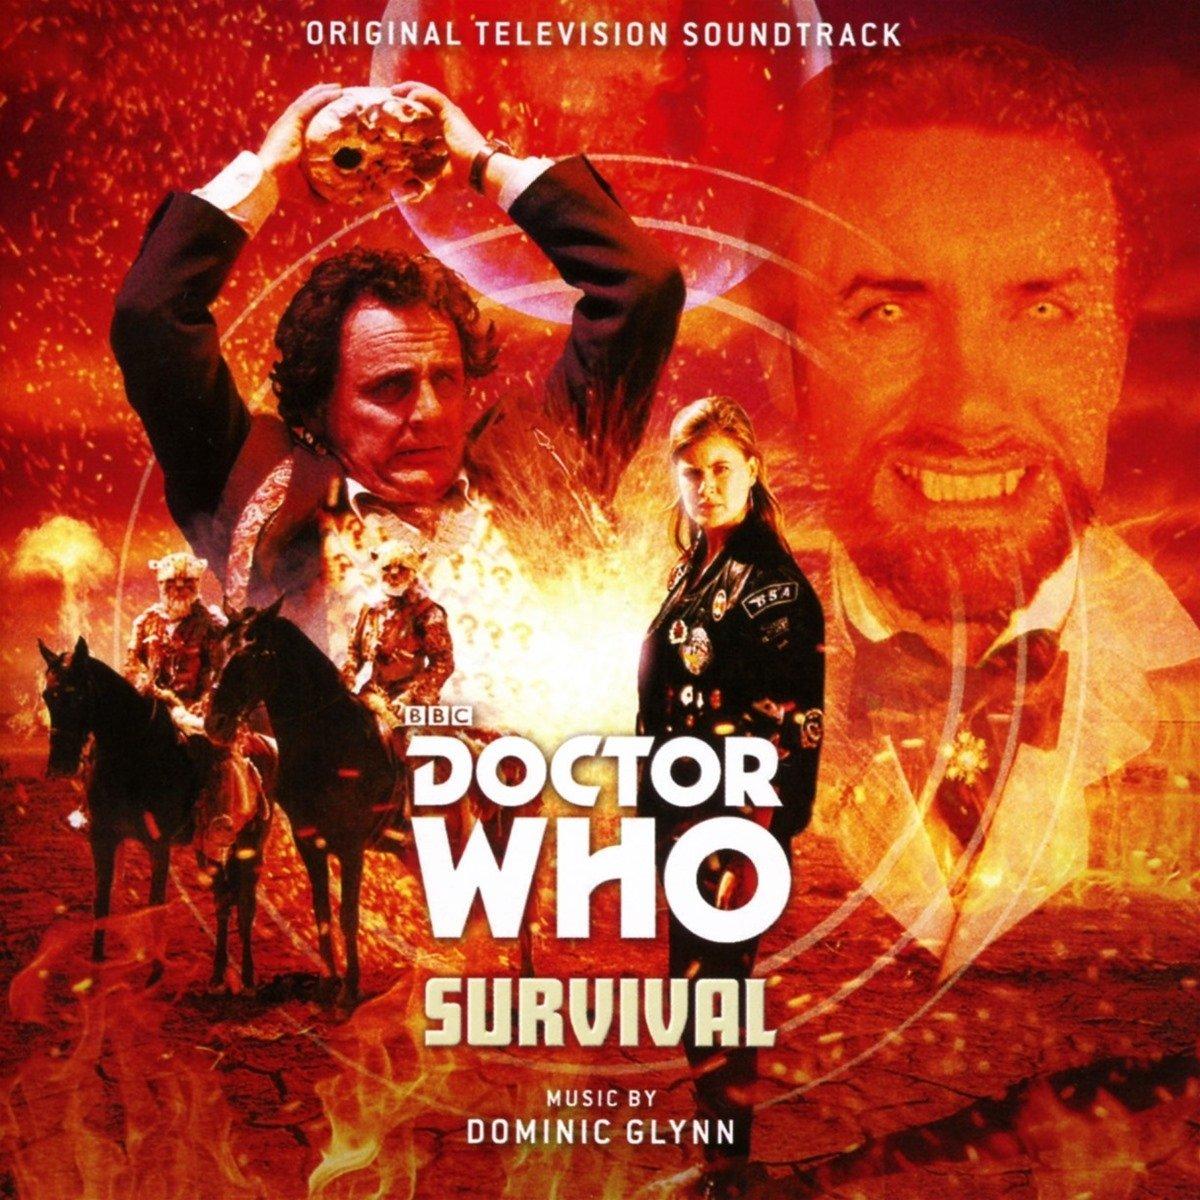 Doctor Who - Survival: Aa.Vv., Dominic Glynn: Amazon.es: Música